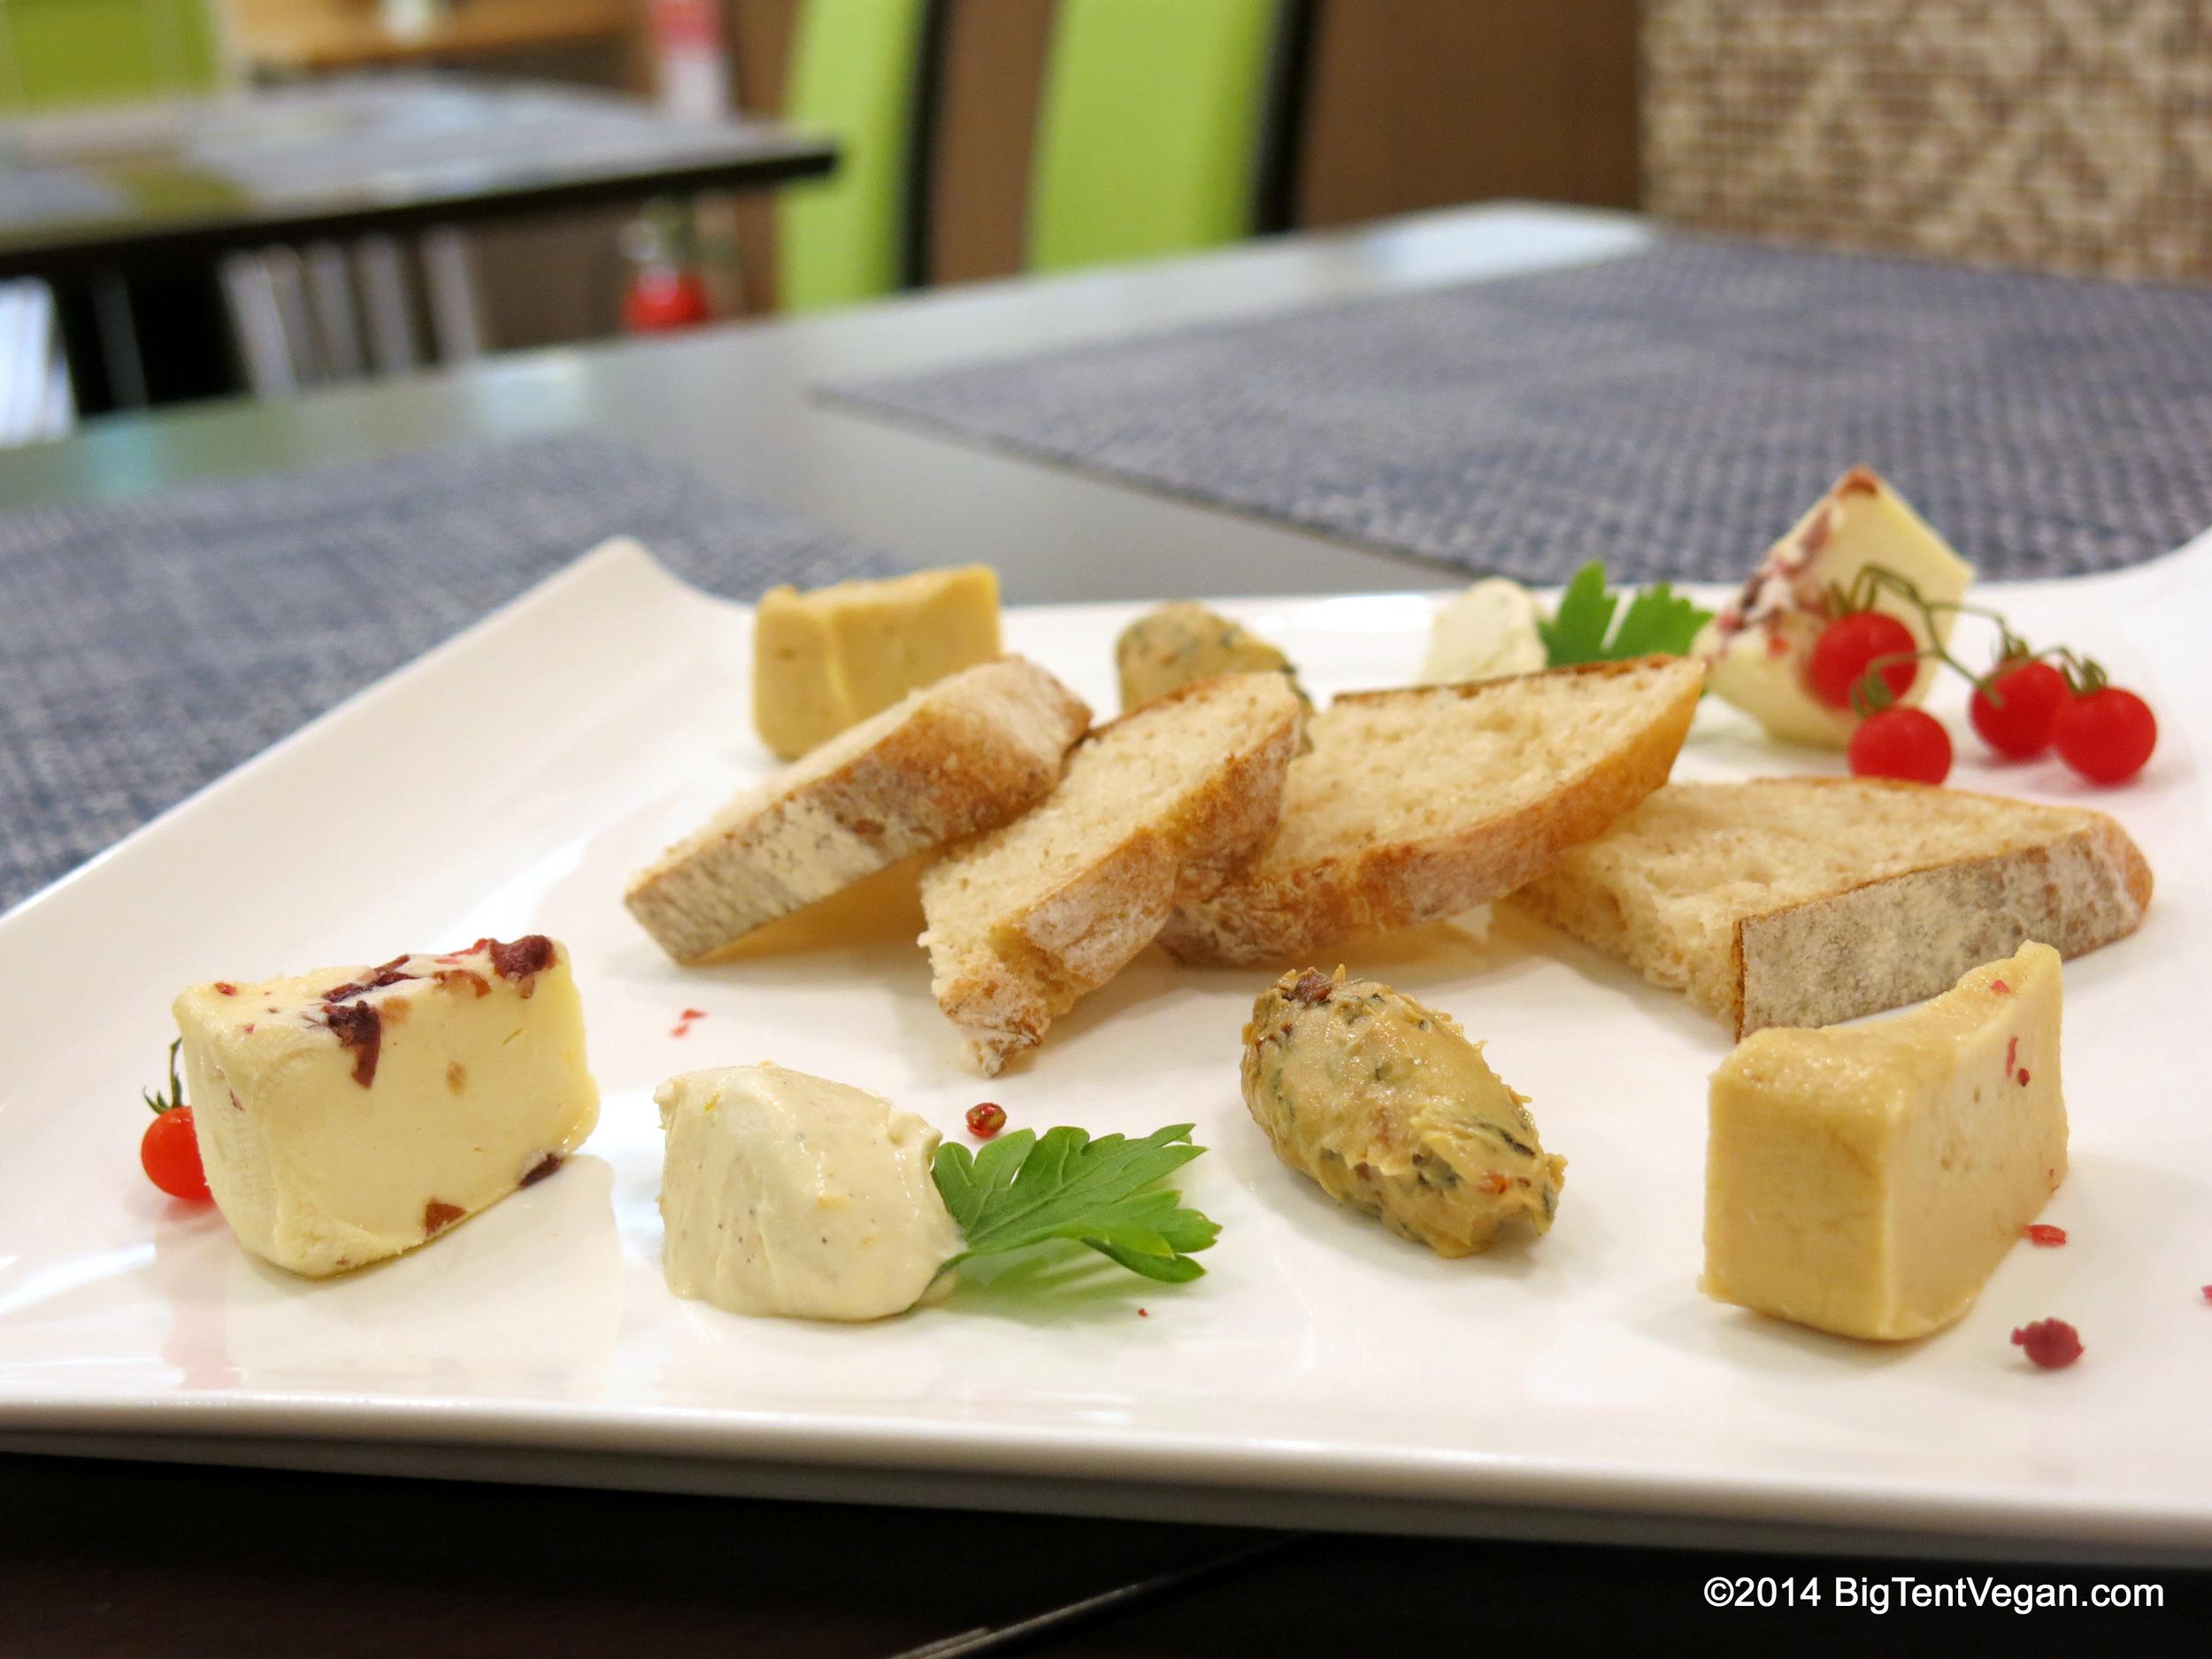 Artisan vegan cheese plate based on miyoko Schinner's recipes, from 100% vegan choice cafe in kyoto, japan.